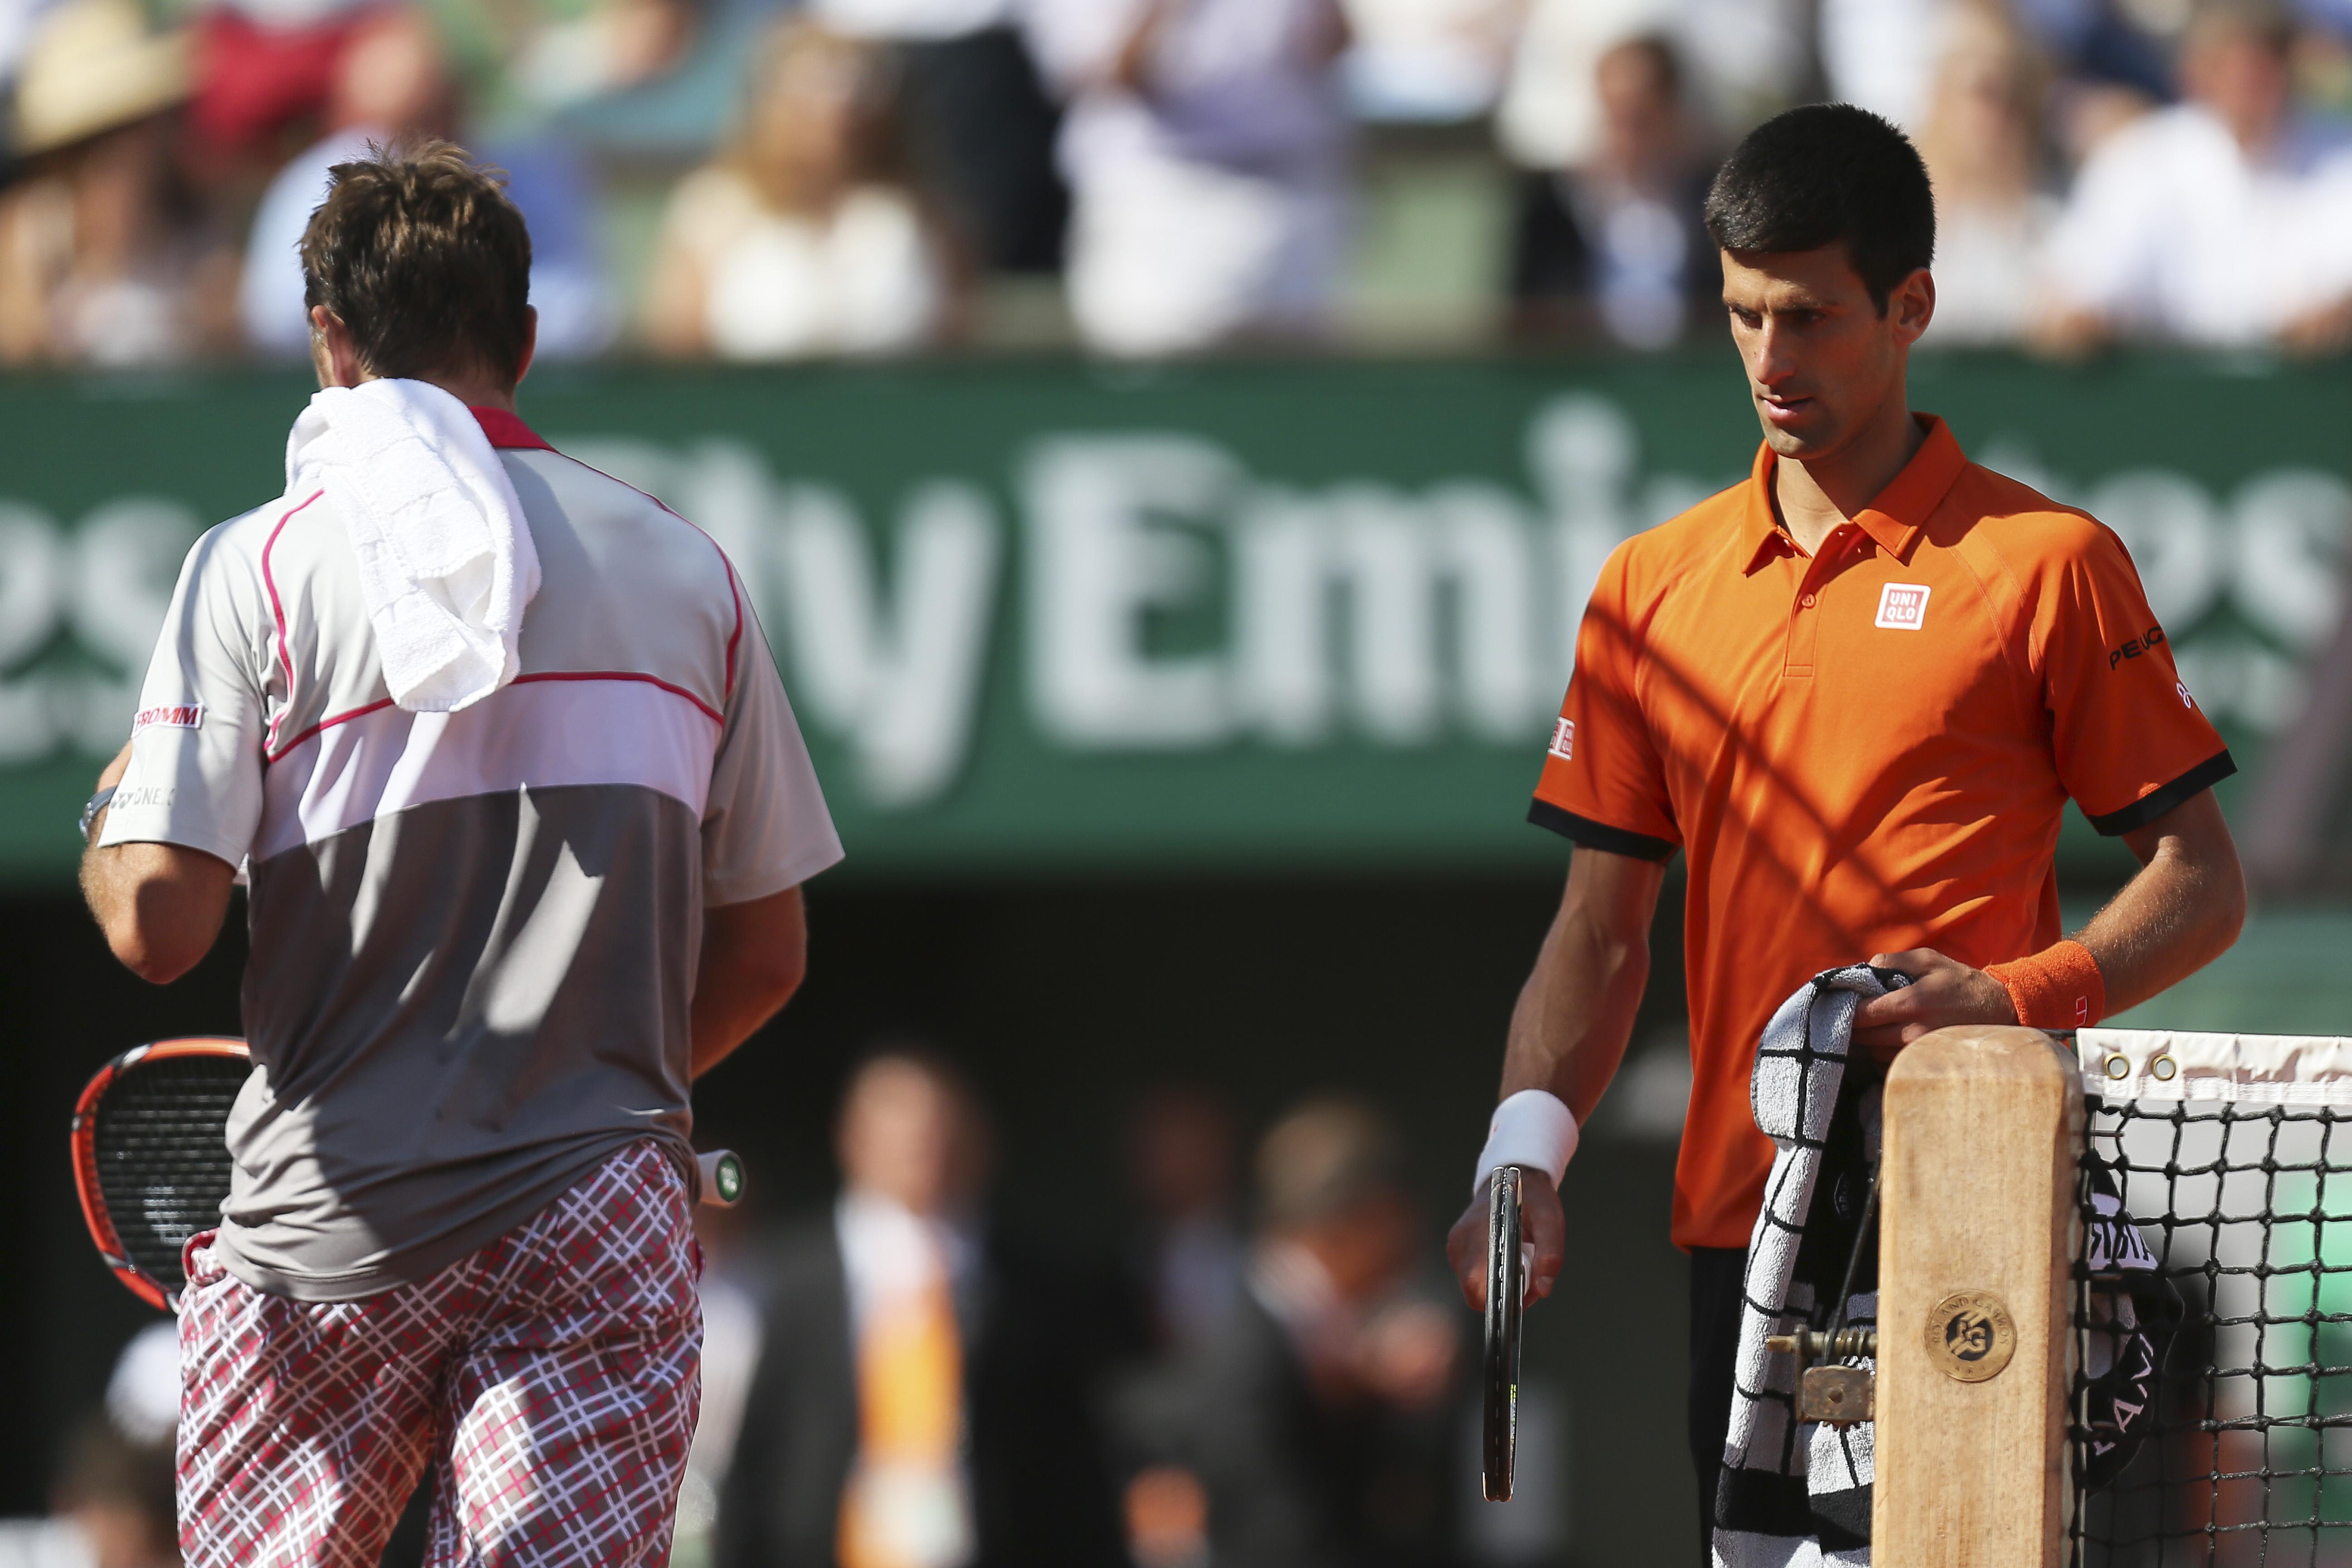 Serbia's Novak Djokovic, right, passes Switzerland's Stan Wawrinka in the men's final of the French Open tennis tournament at the Roland Garros stadium, in Paris, France, Sunday, June 7, 2015. (AP Photo/David Vincent)